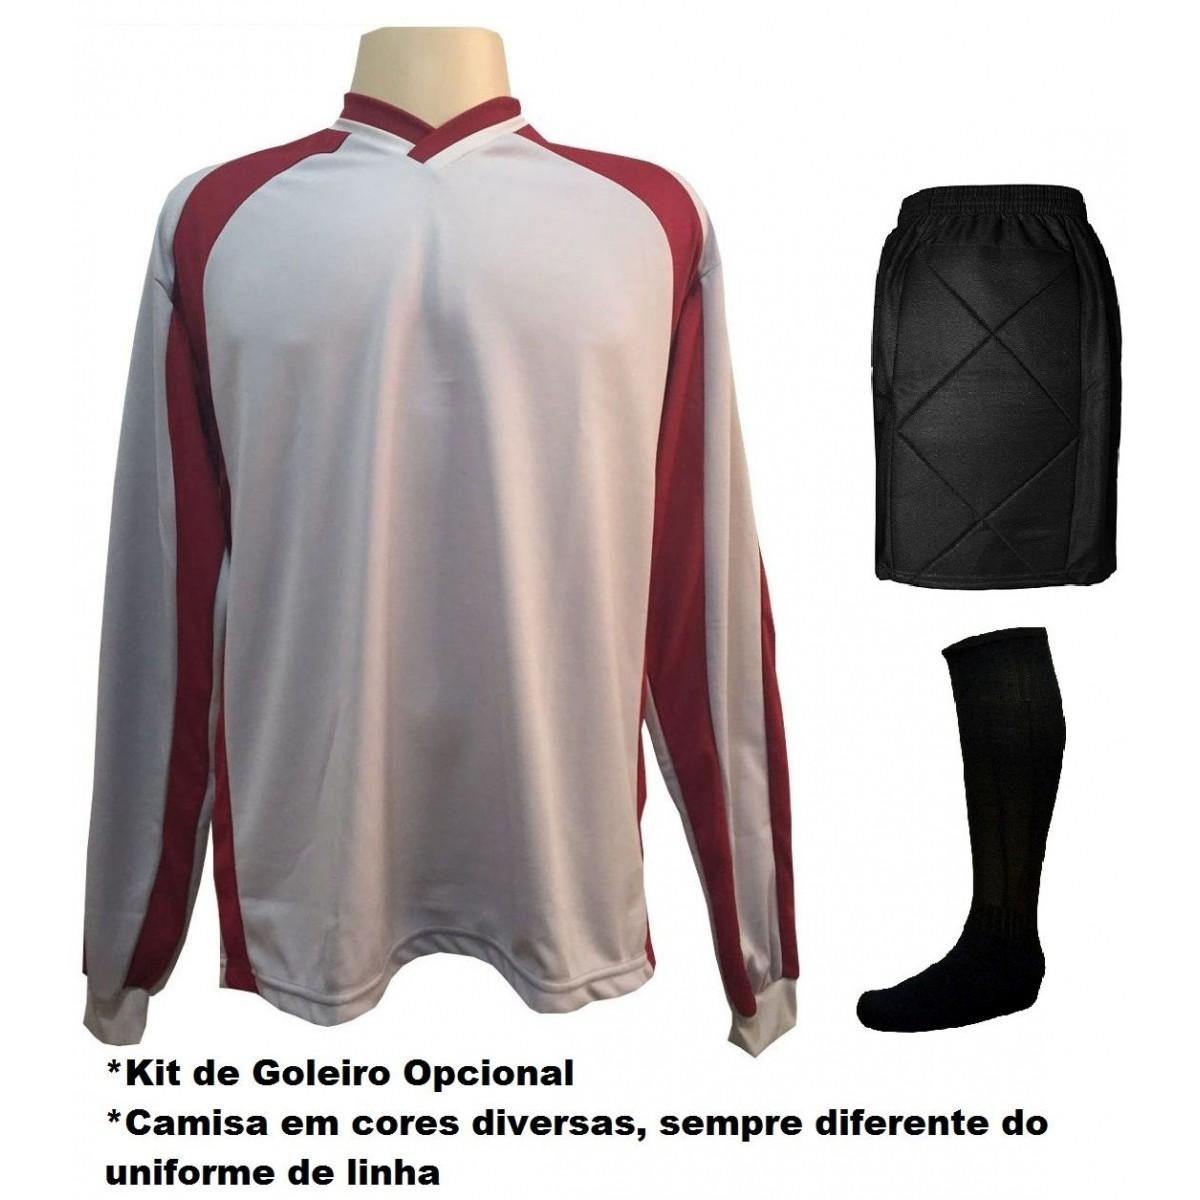 Fardamento Completo modelo Bélgica 20+1 (20 camisas Royal/Branco + 20 calções modelo Copa Royal/Branco + 20 pares de meiões Royal + 1 conjunto de goleiro) + Brindes